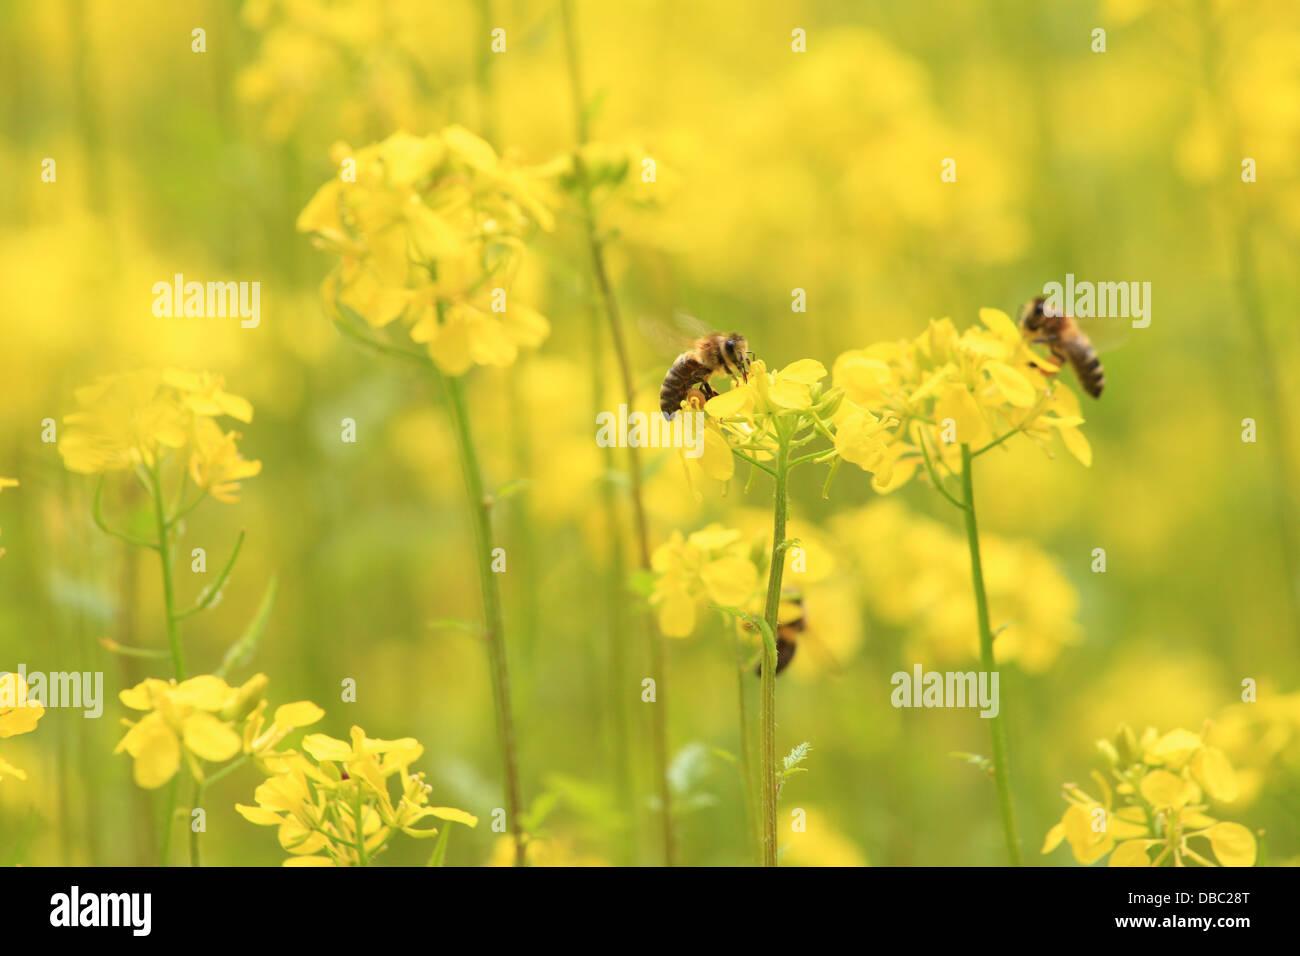 The European honey bees (Apis mellifera) collecting nectar on the flowers of White mustard plants(Sinapis alba). - Stock Image